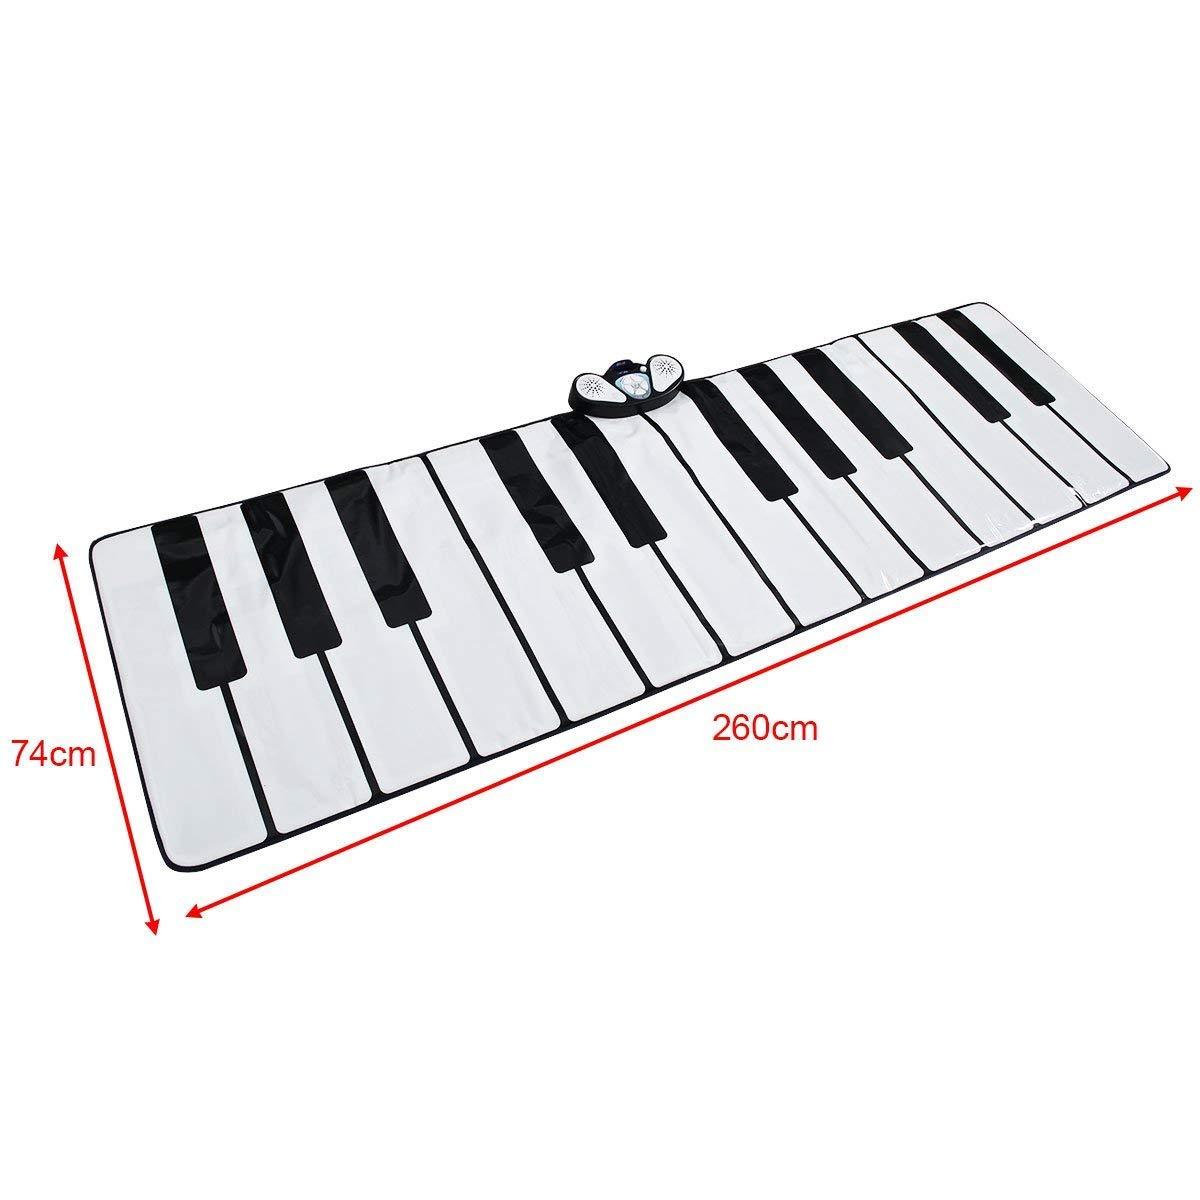 WEALTH Klaviertastatur-Gamepad, Play-Record-Playback-Demo-Modus, Party Dance Music Fußmatte